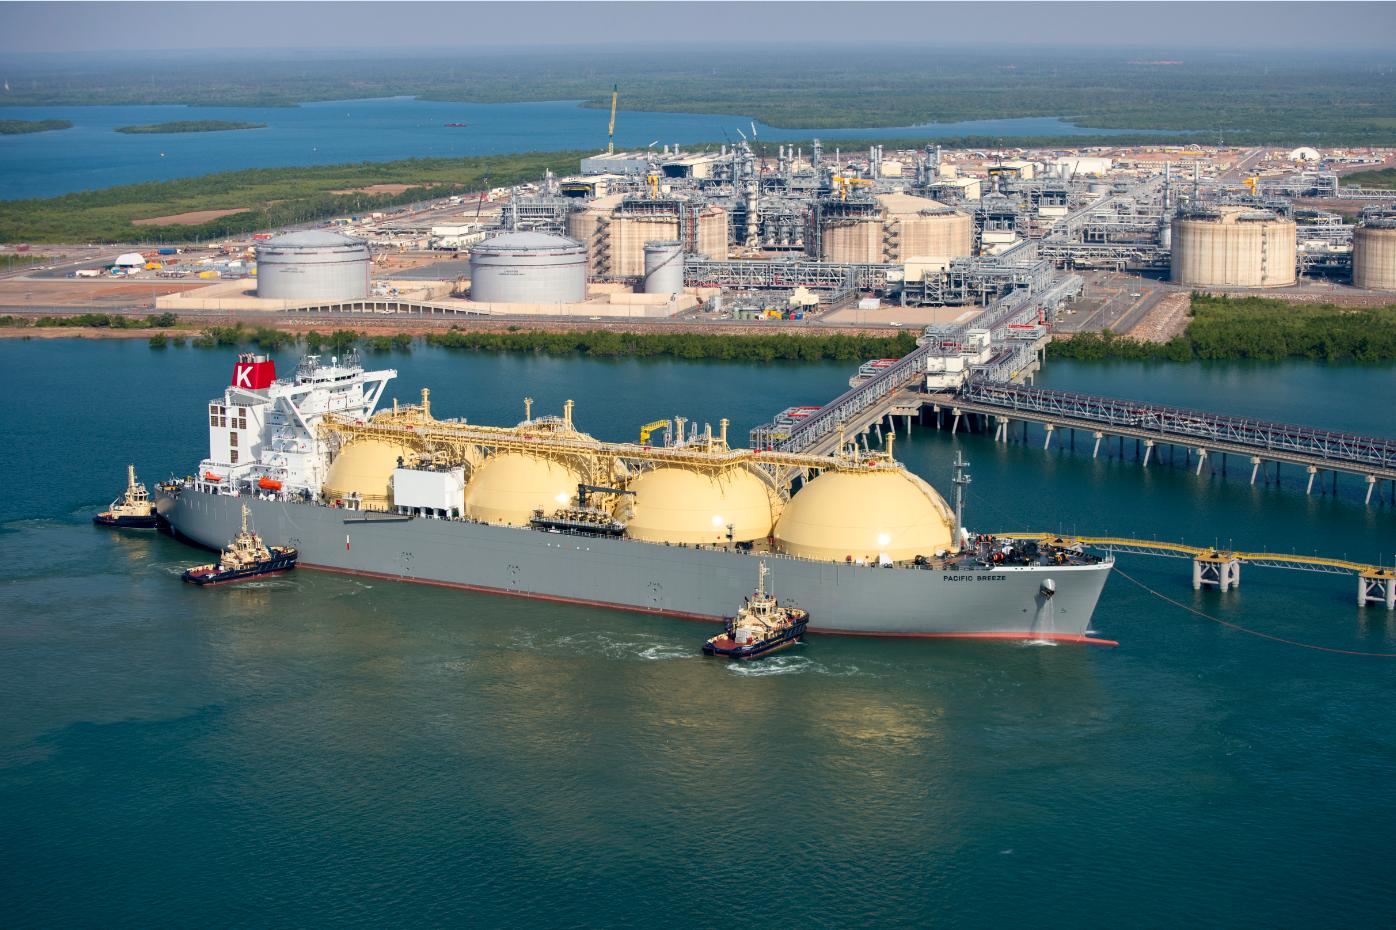 Australia: Ichthys LNG Project Begins Gas Exports | Total.com